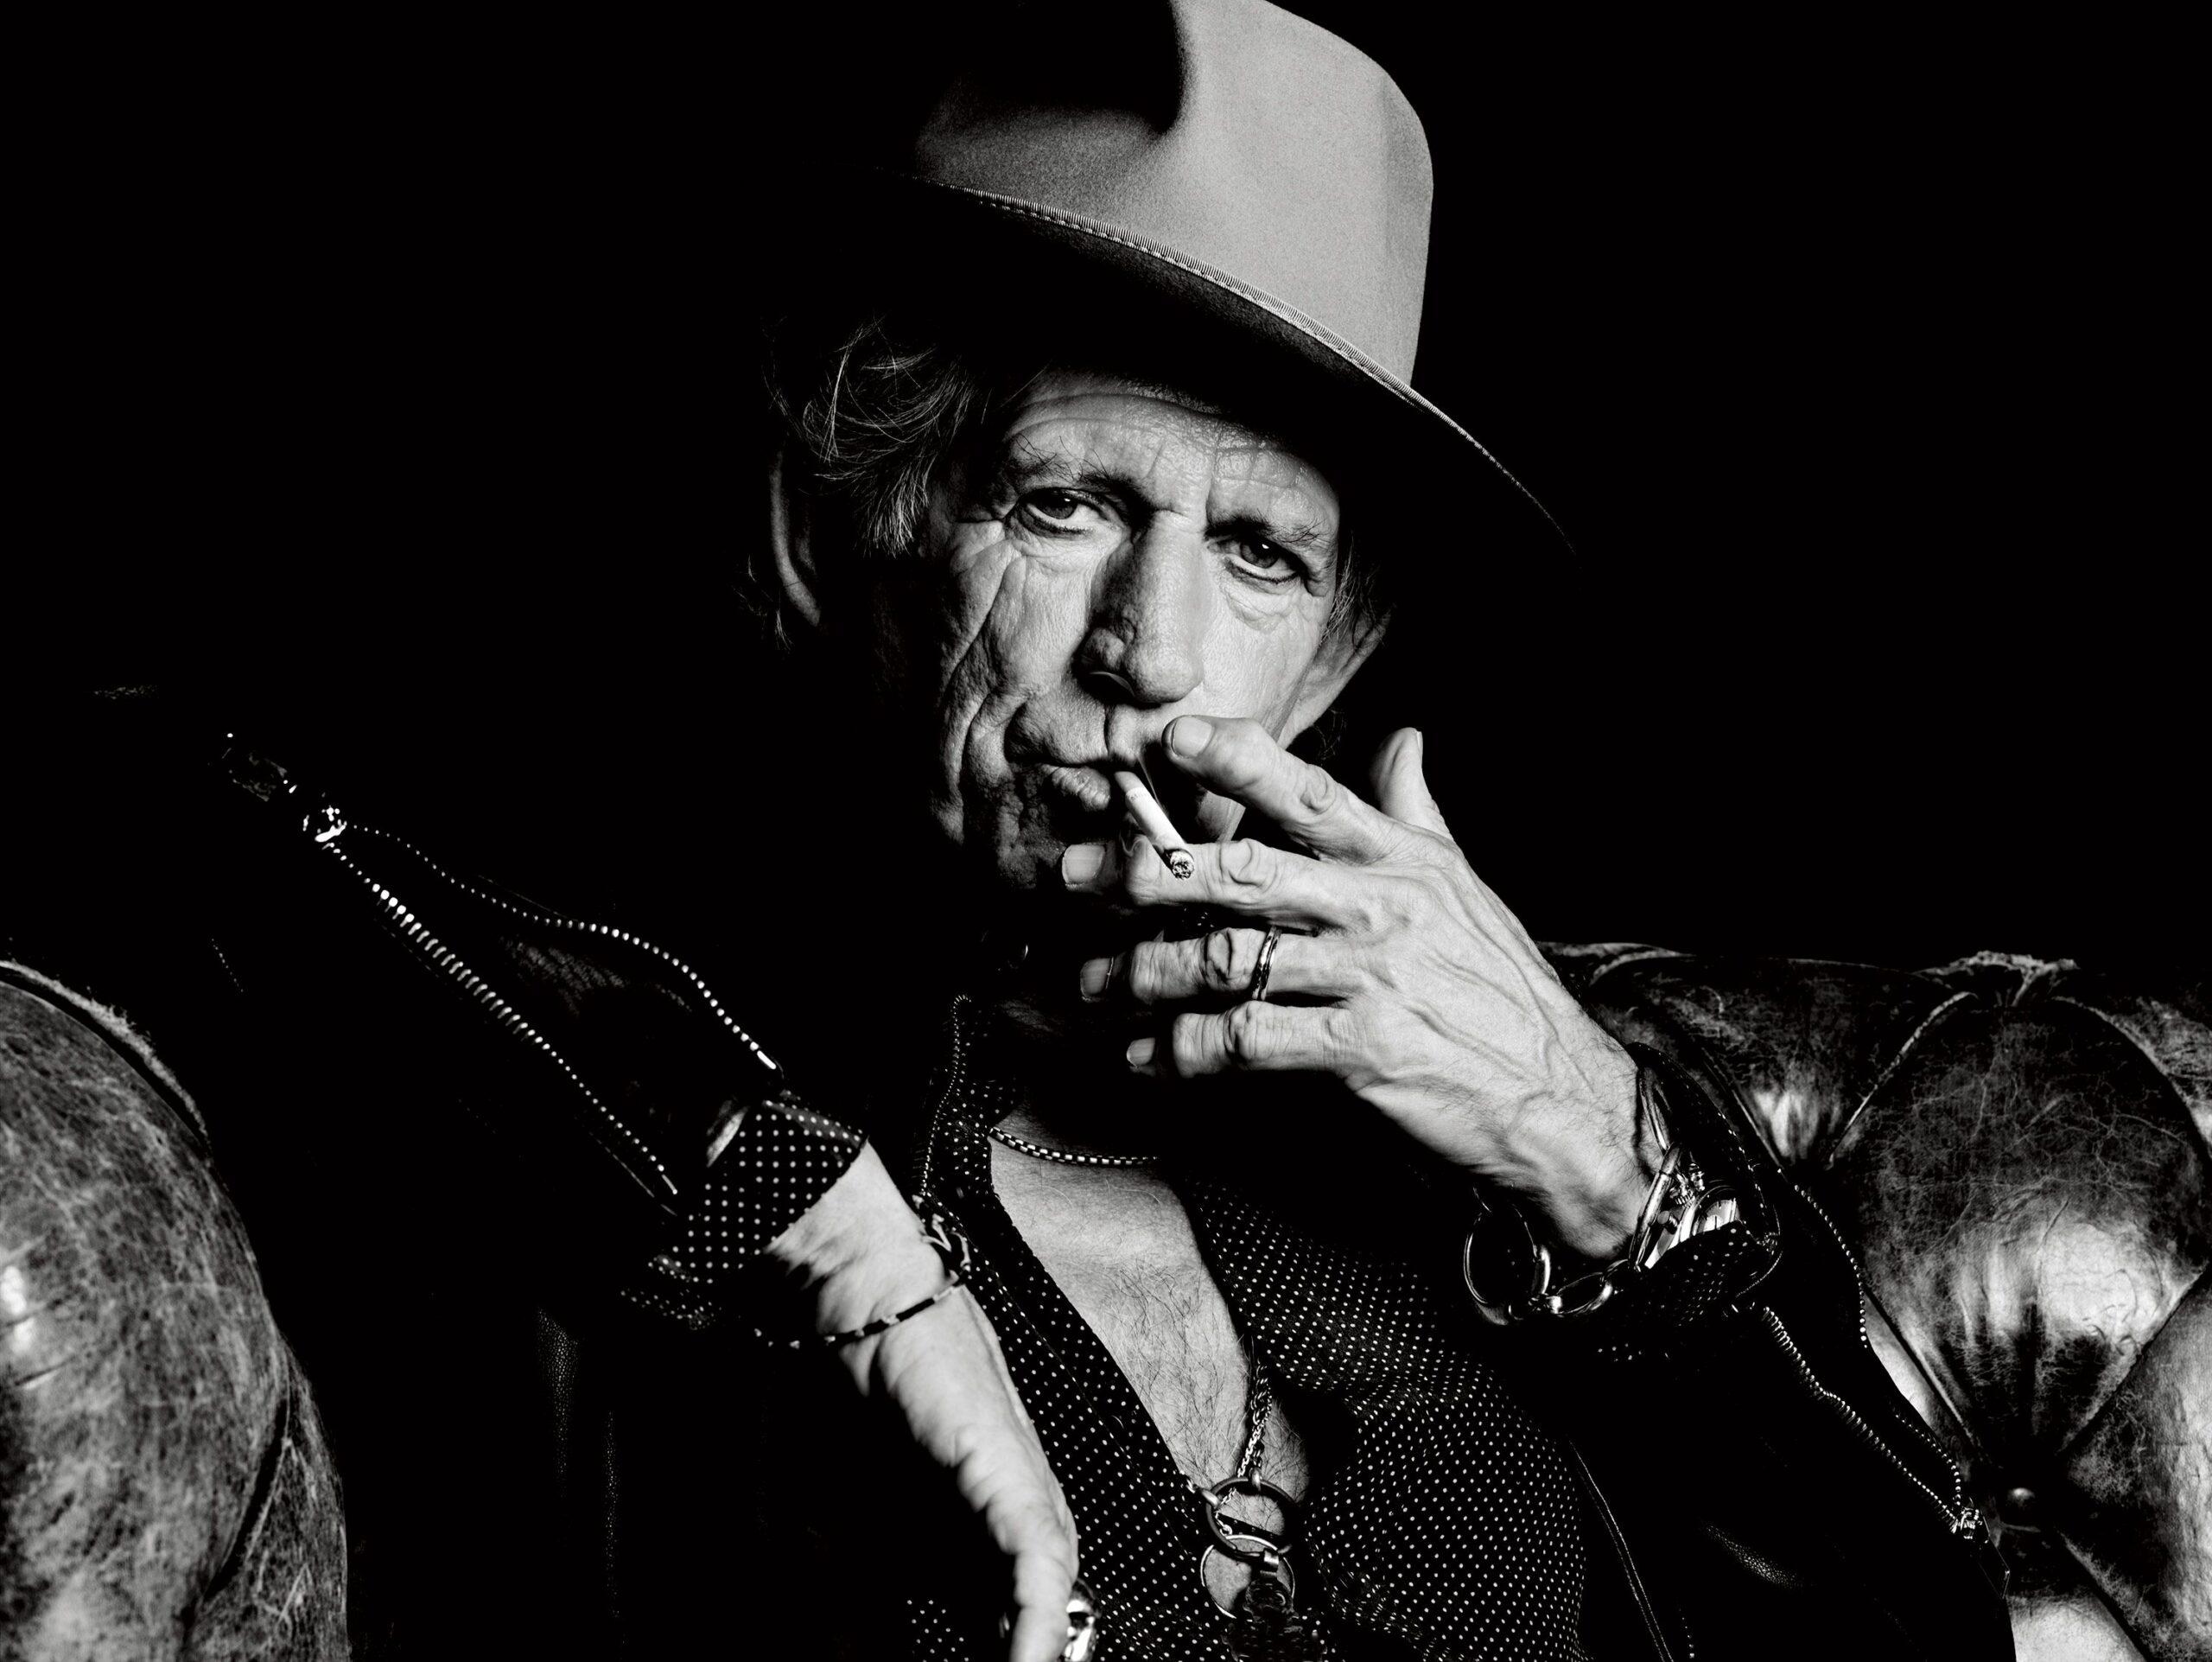 Keith Richards - Credits: Esquire.com